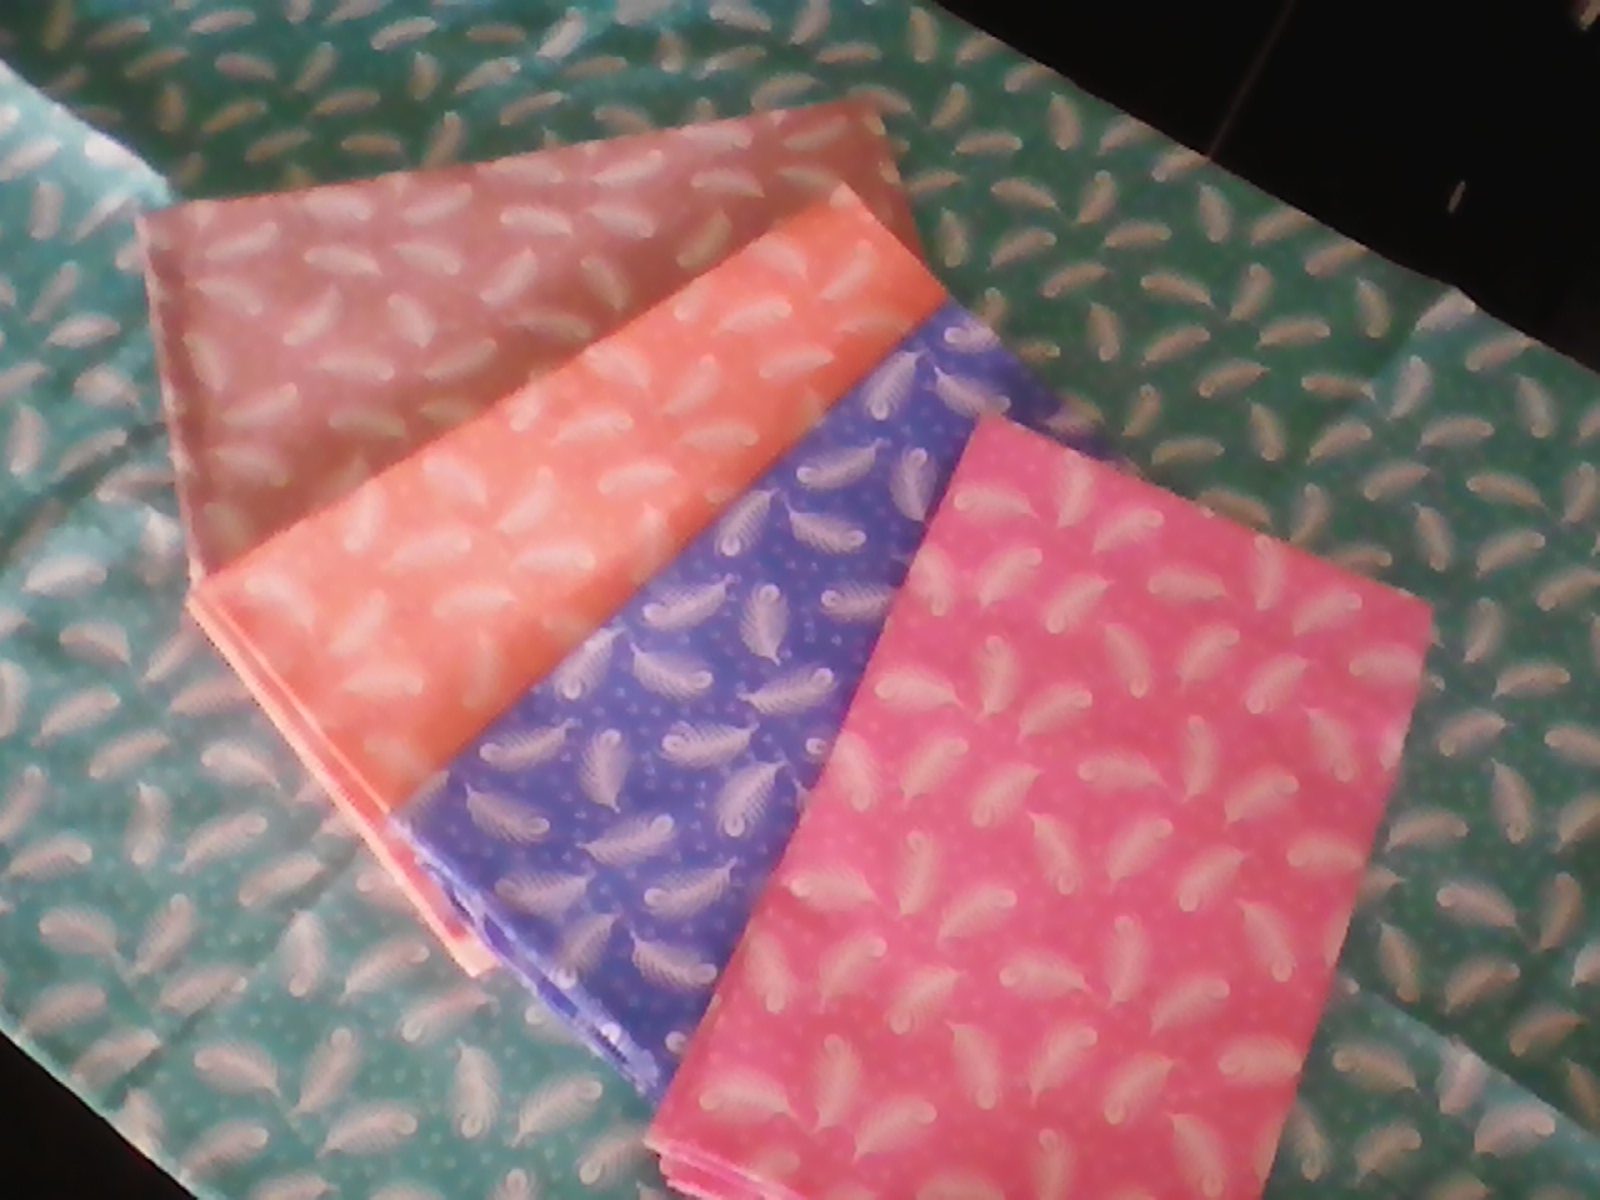 Jual kain batik motif bulu warna soft  zahir batik jogja  Tokopedia